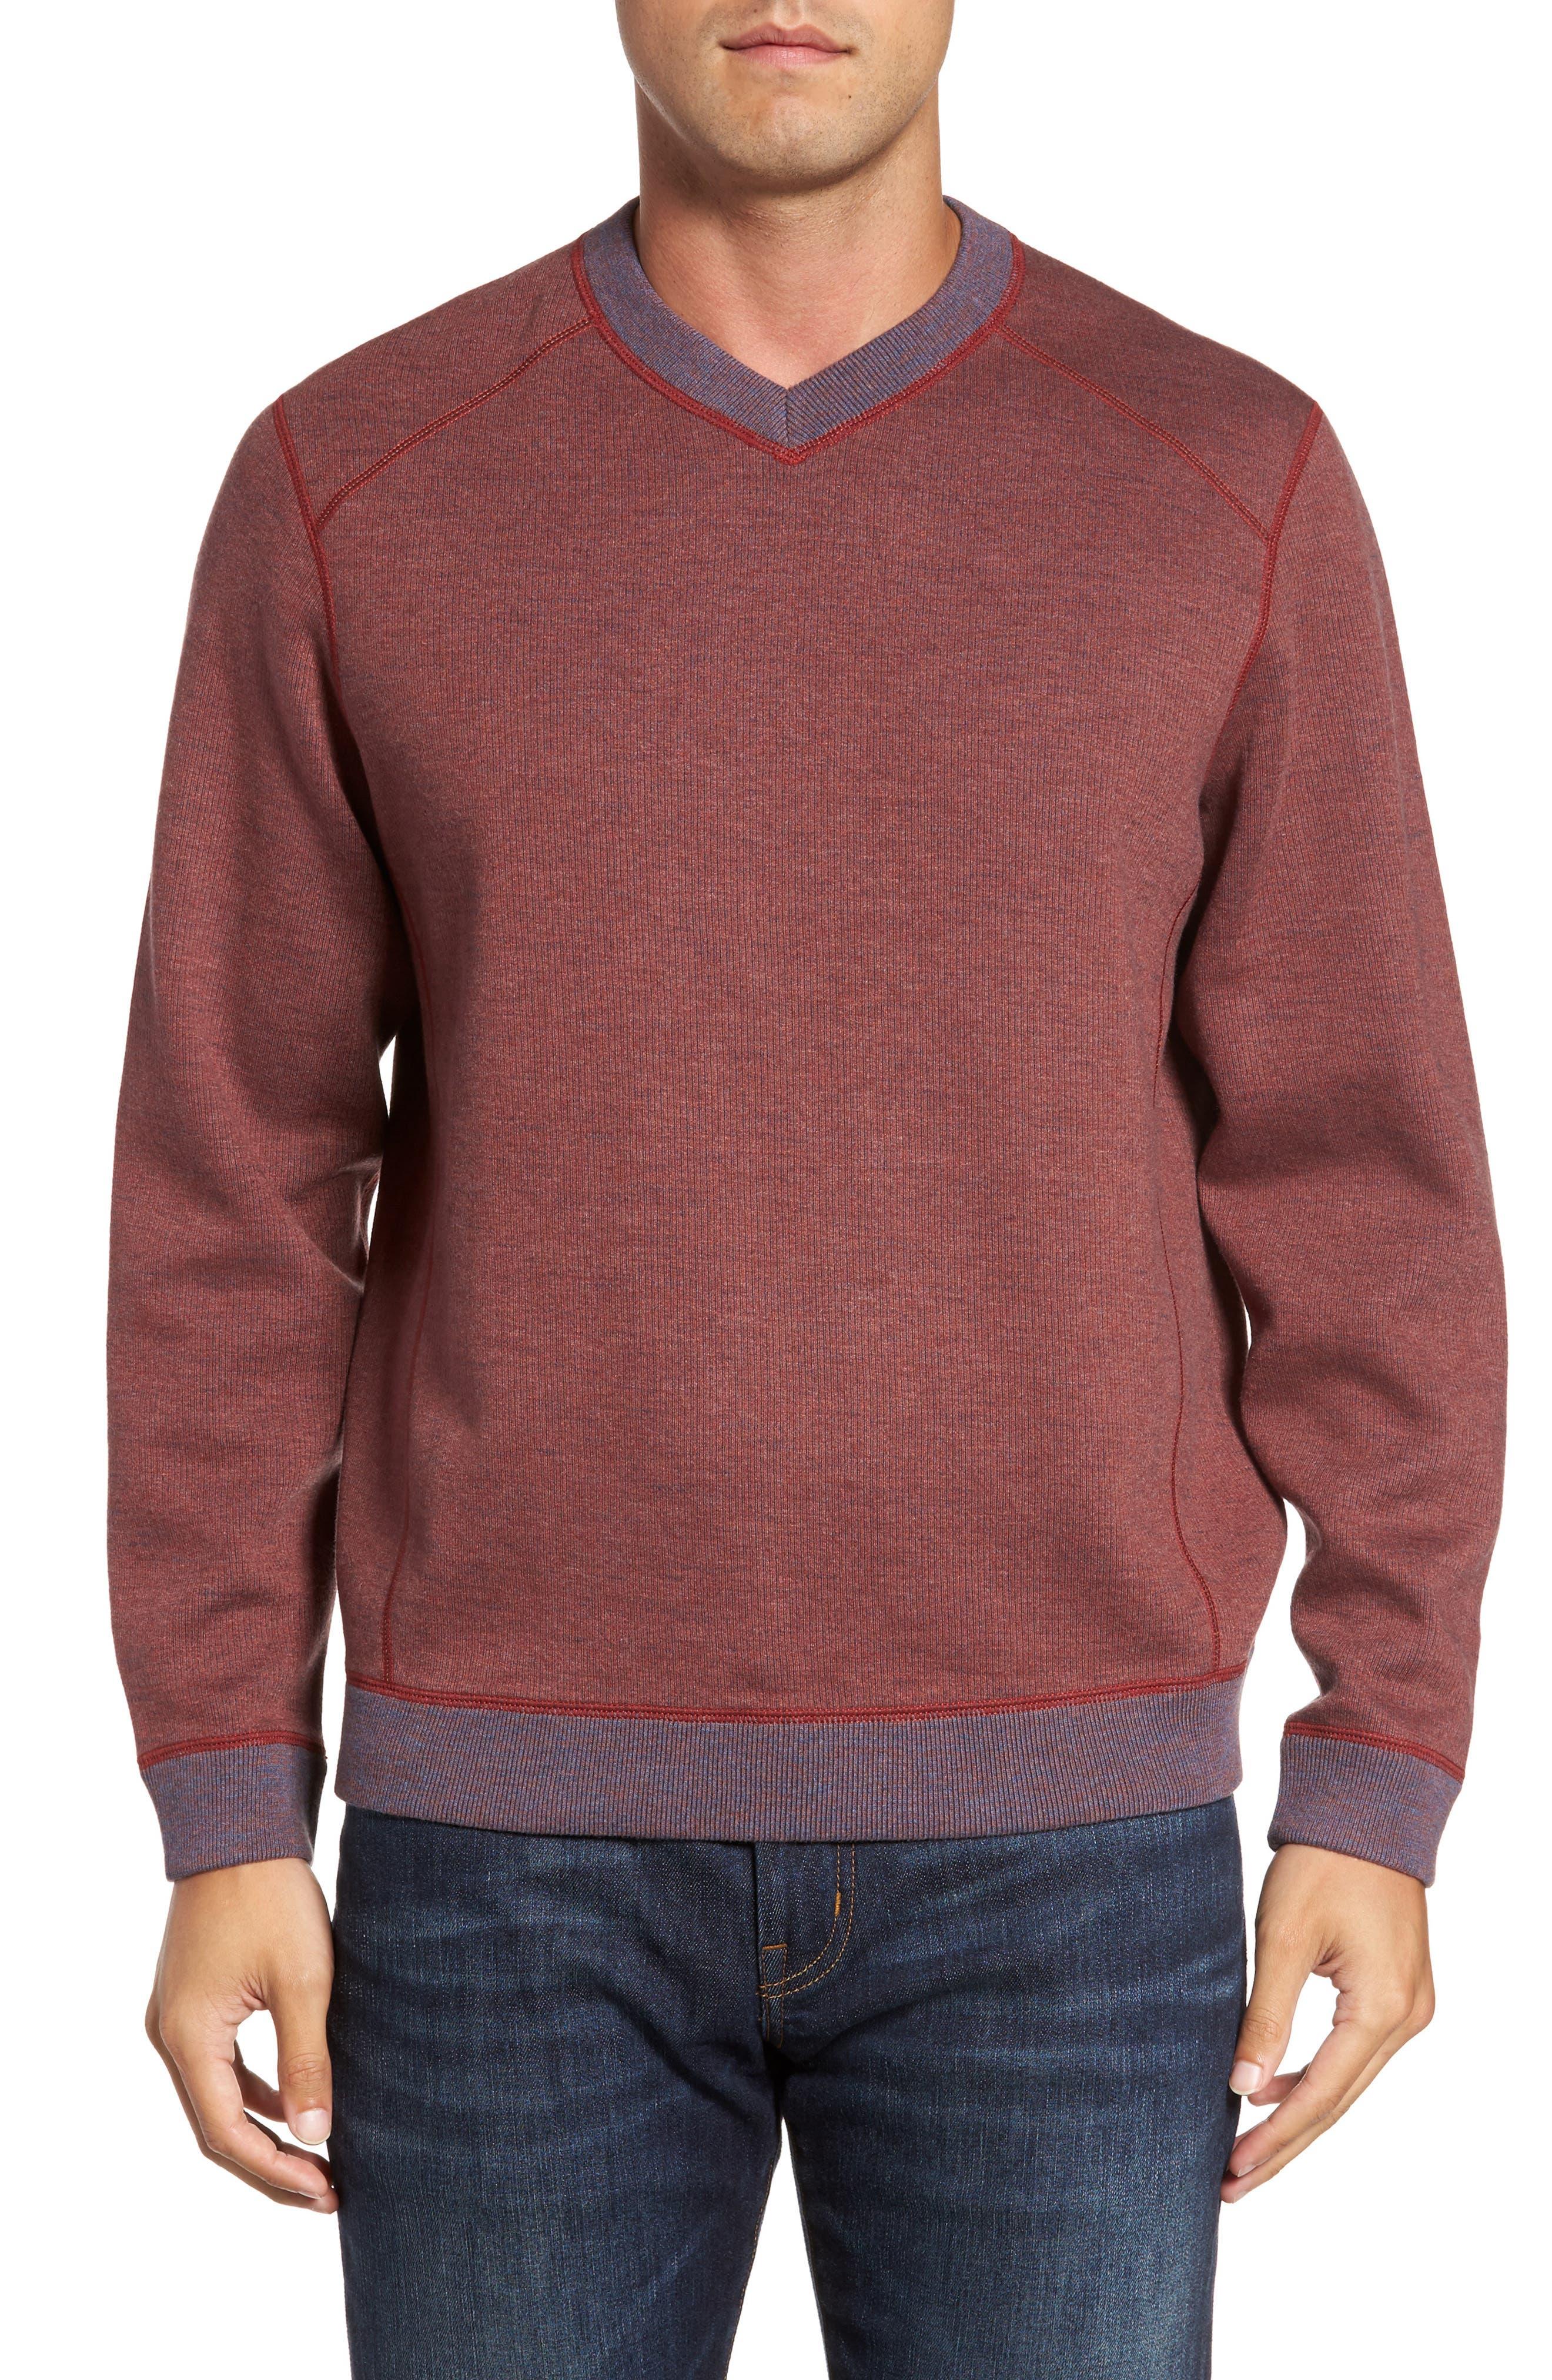 Main Image - Tommy Bahama Flipside Pro Reversible Sweatshirt